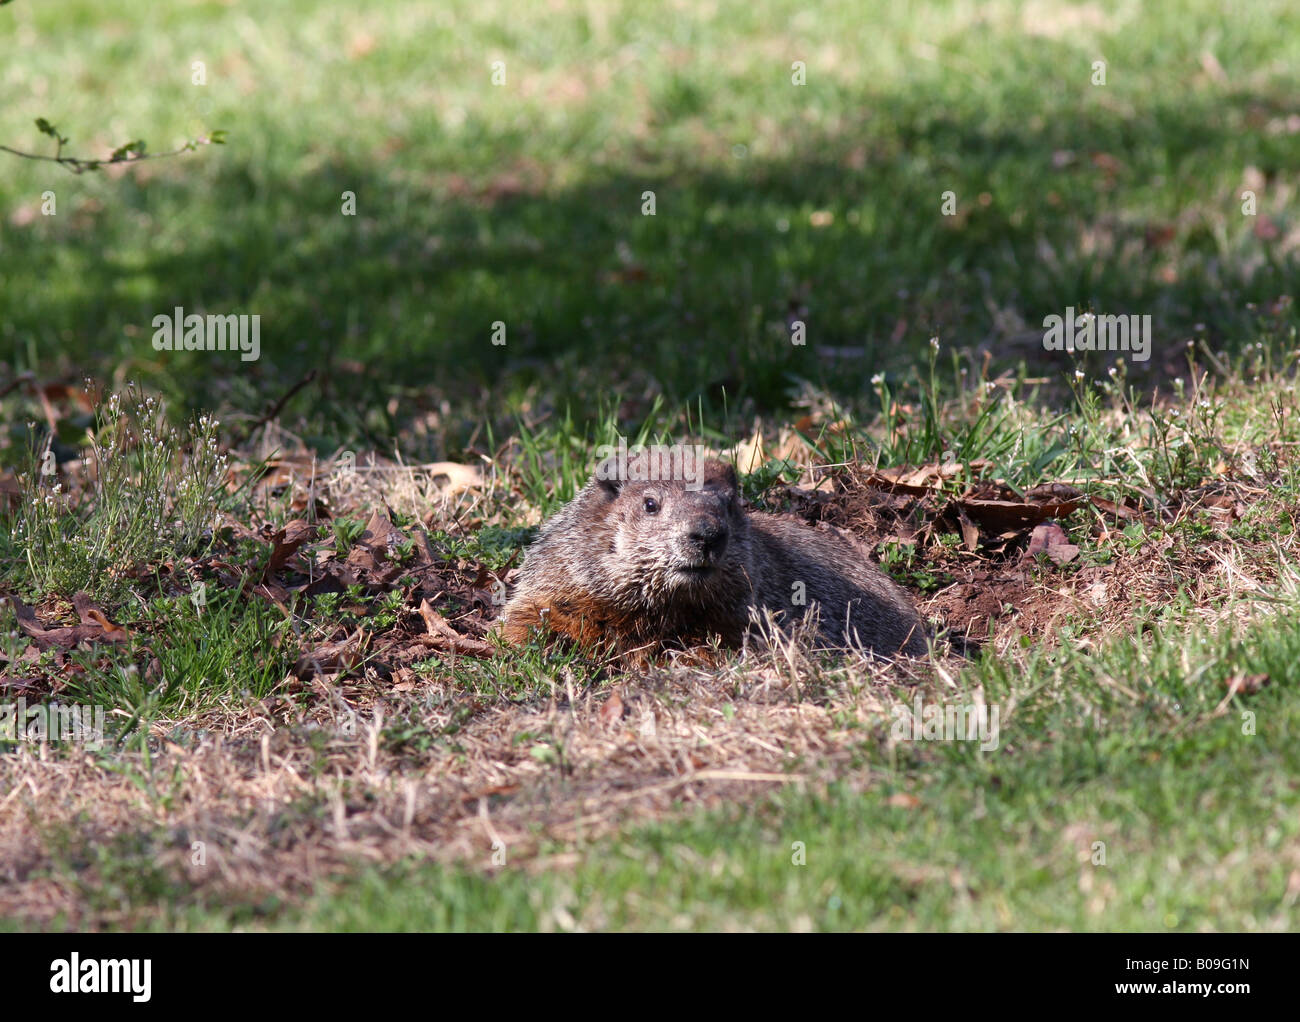 Woodchuck Groundhog at its burrow. - Stock Image